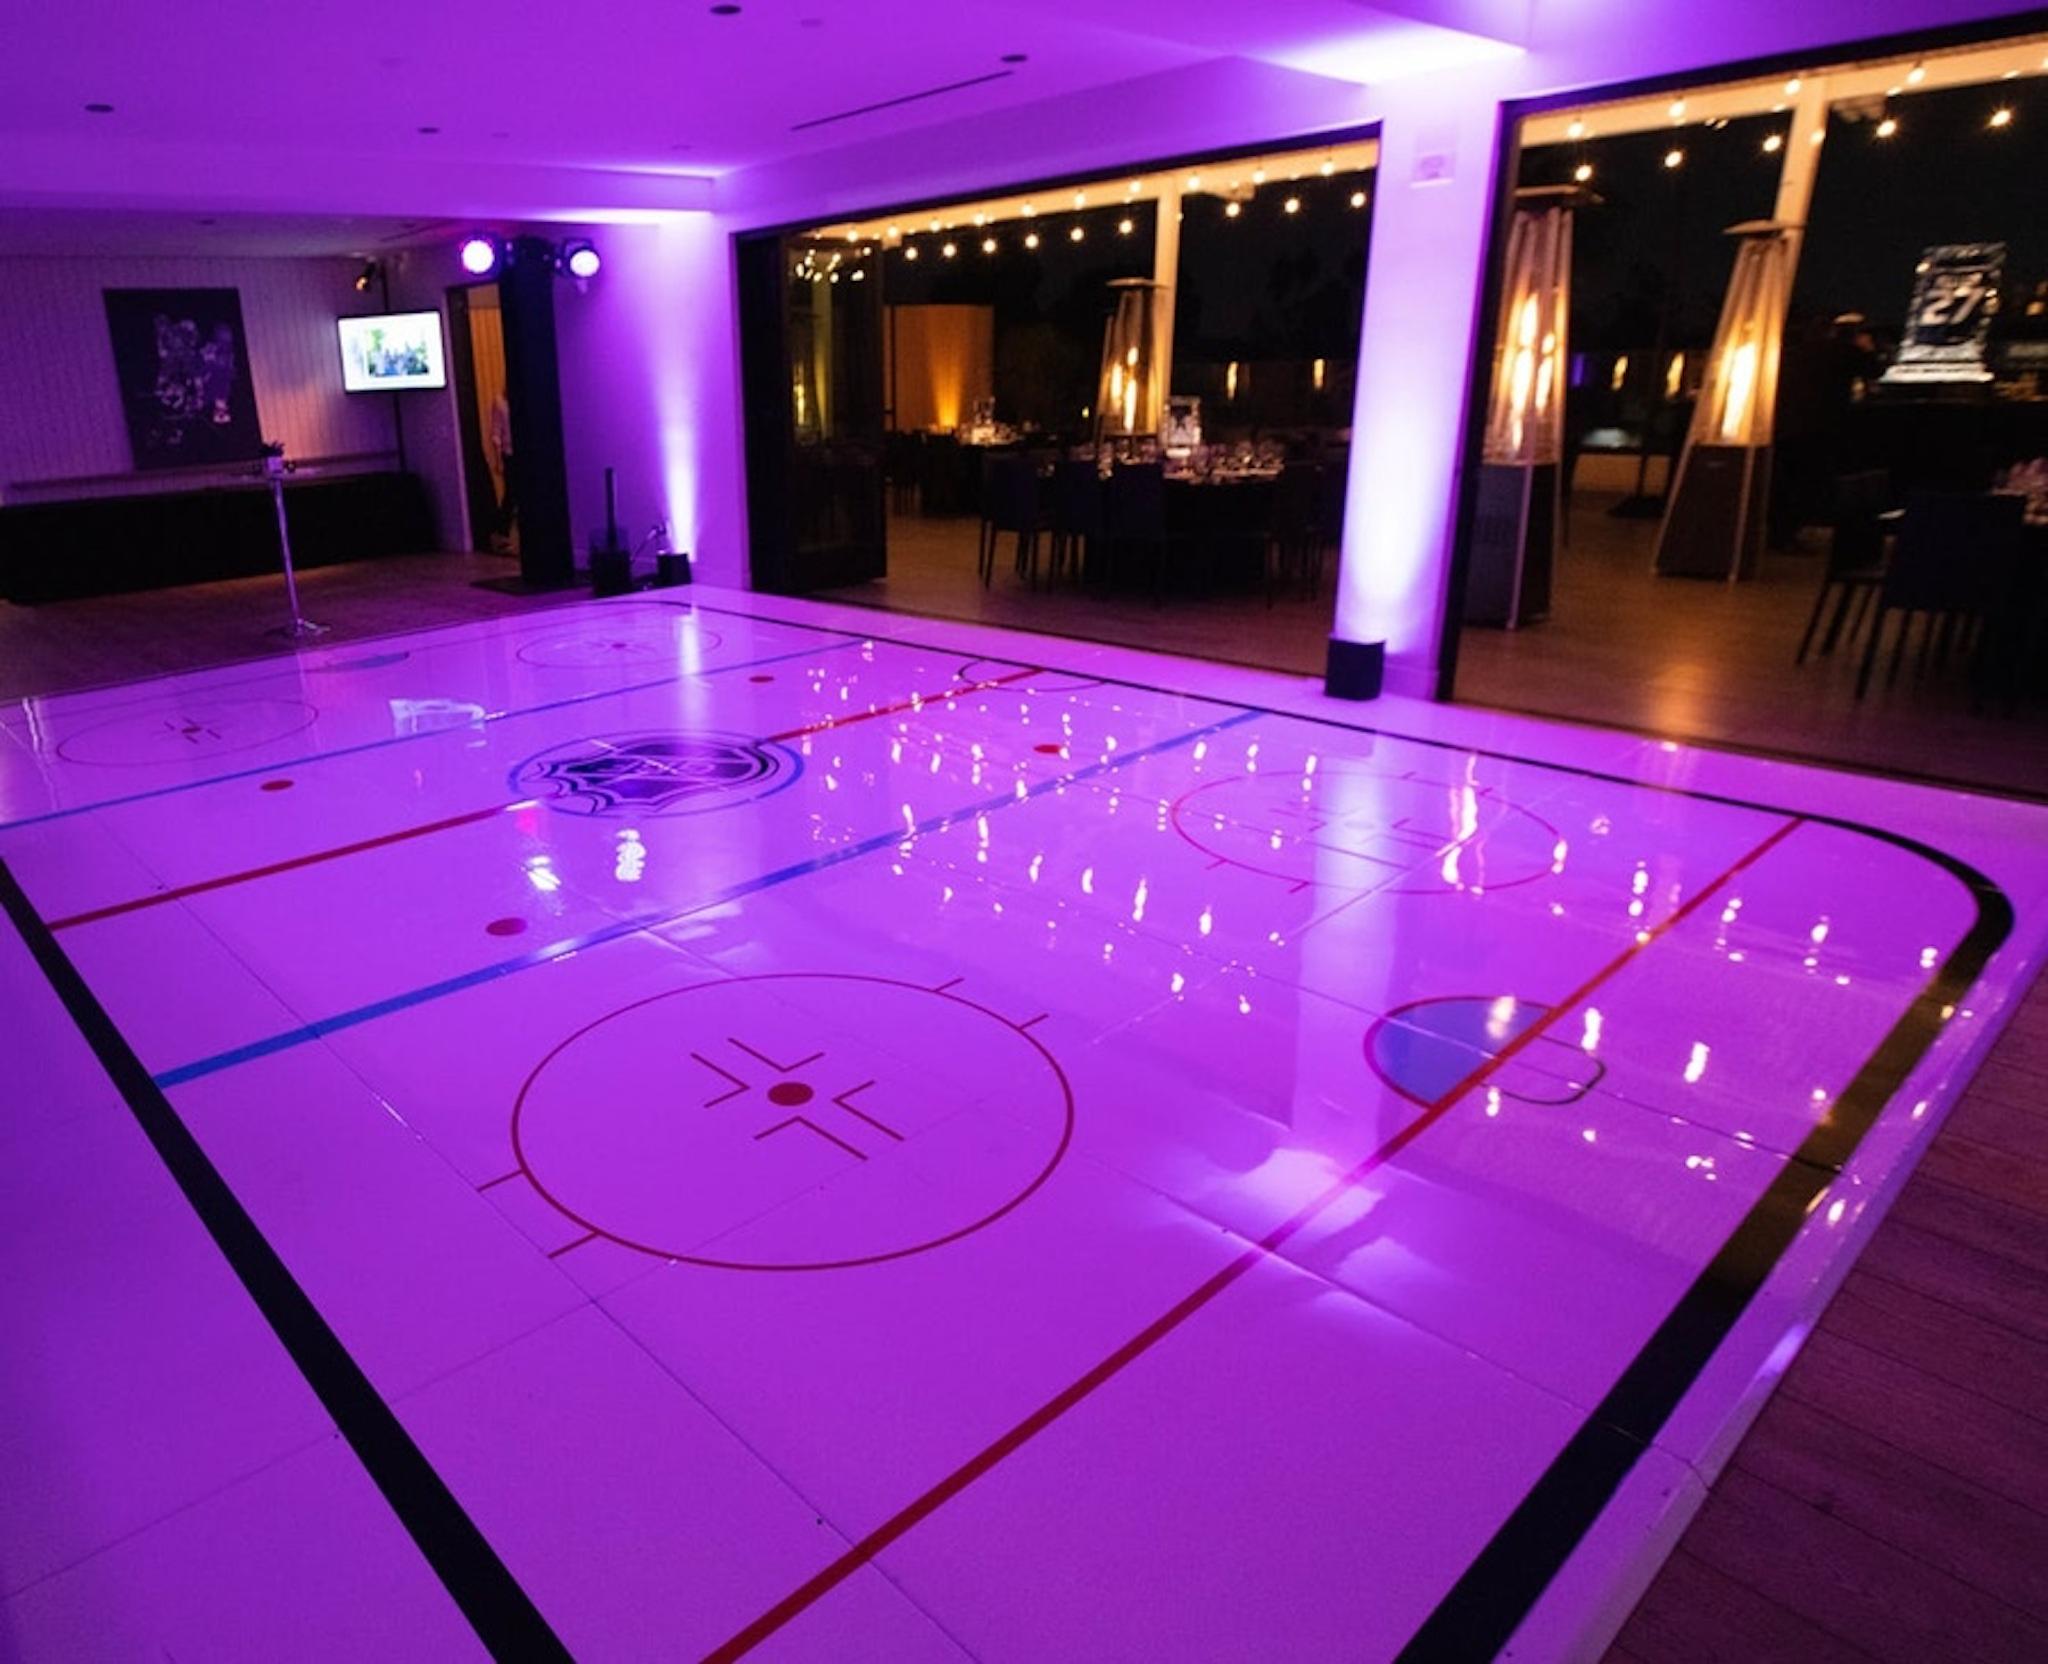 ice rink mitzvah venue